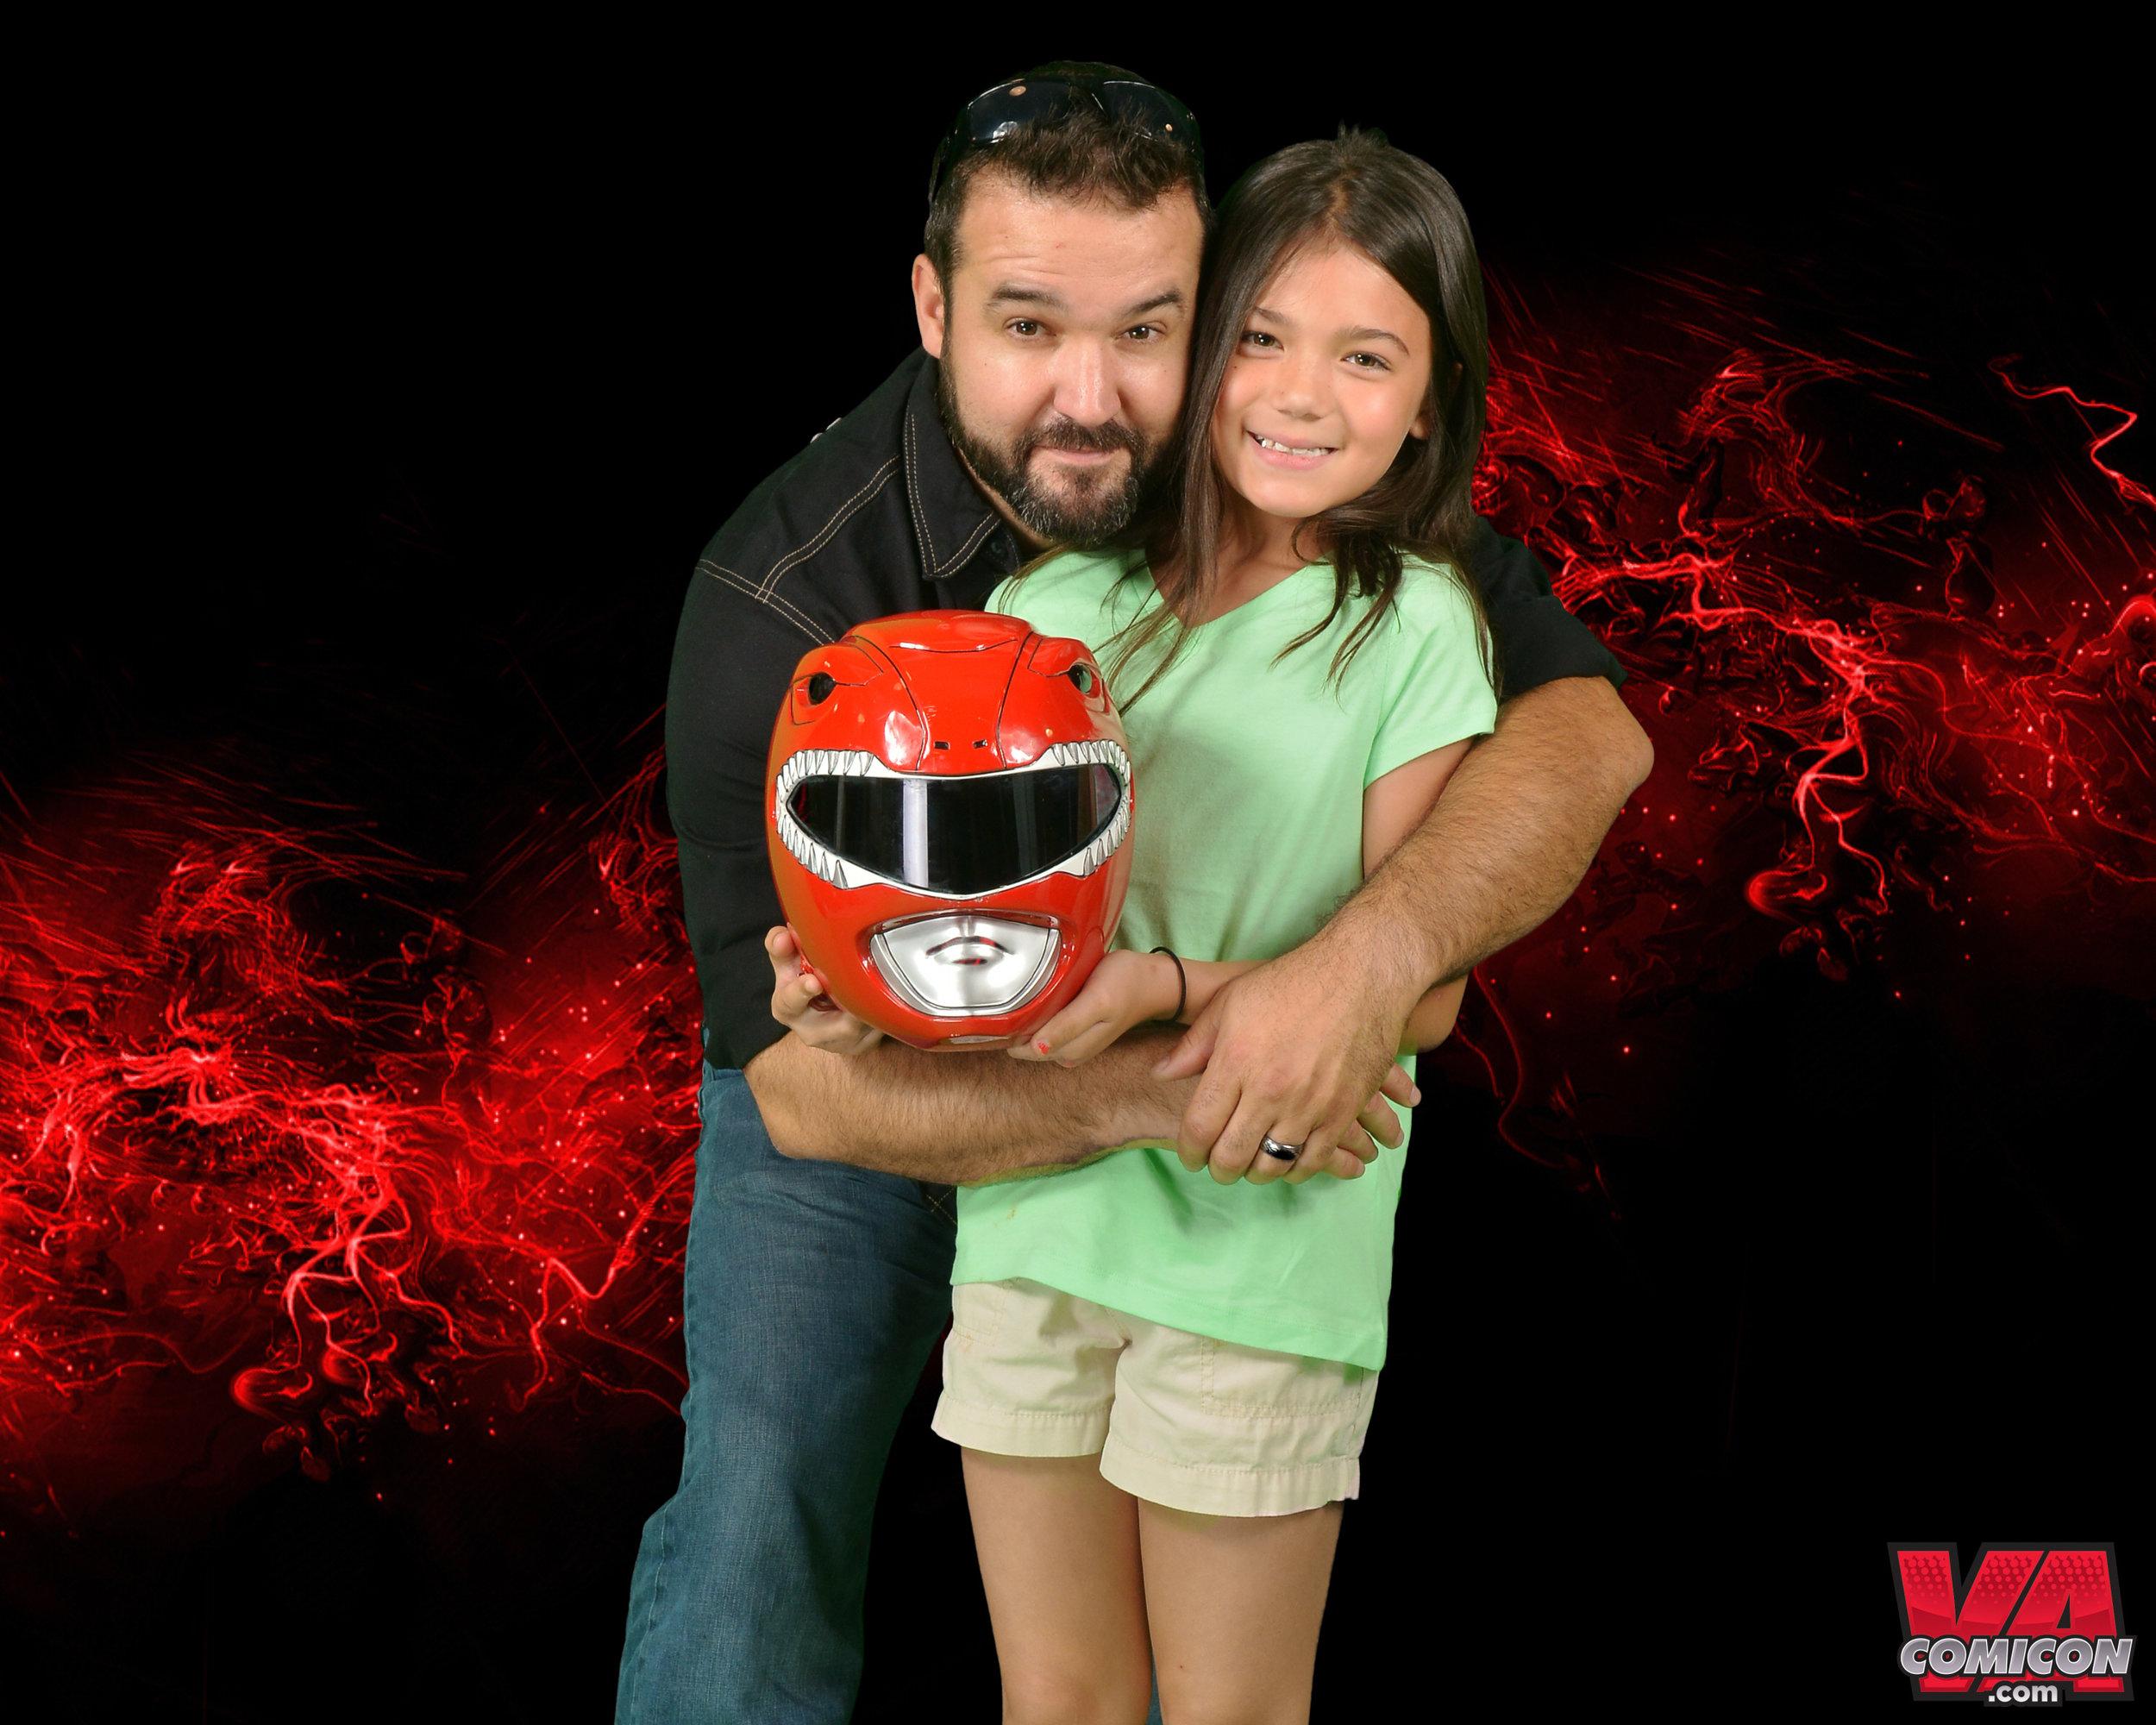 Austin-St-John-Power-Rangers-VA-Comic-Con